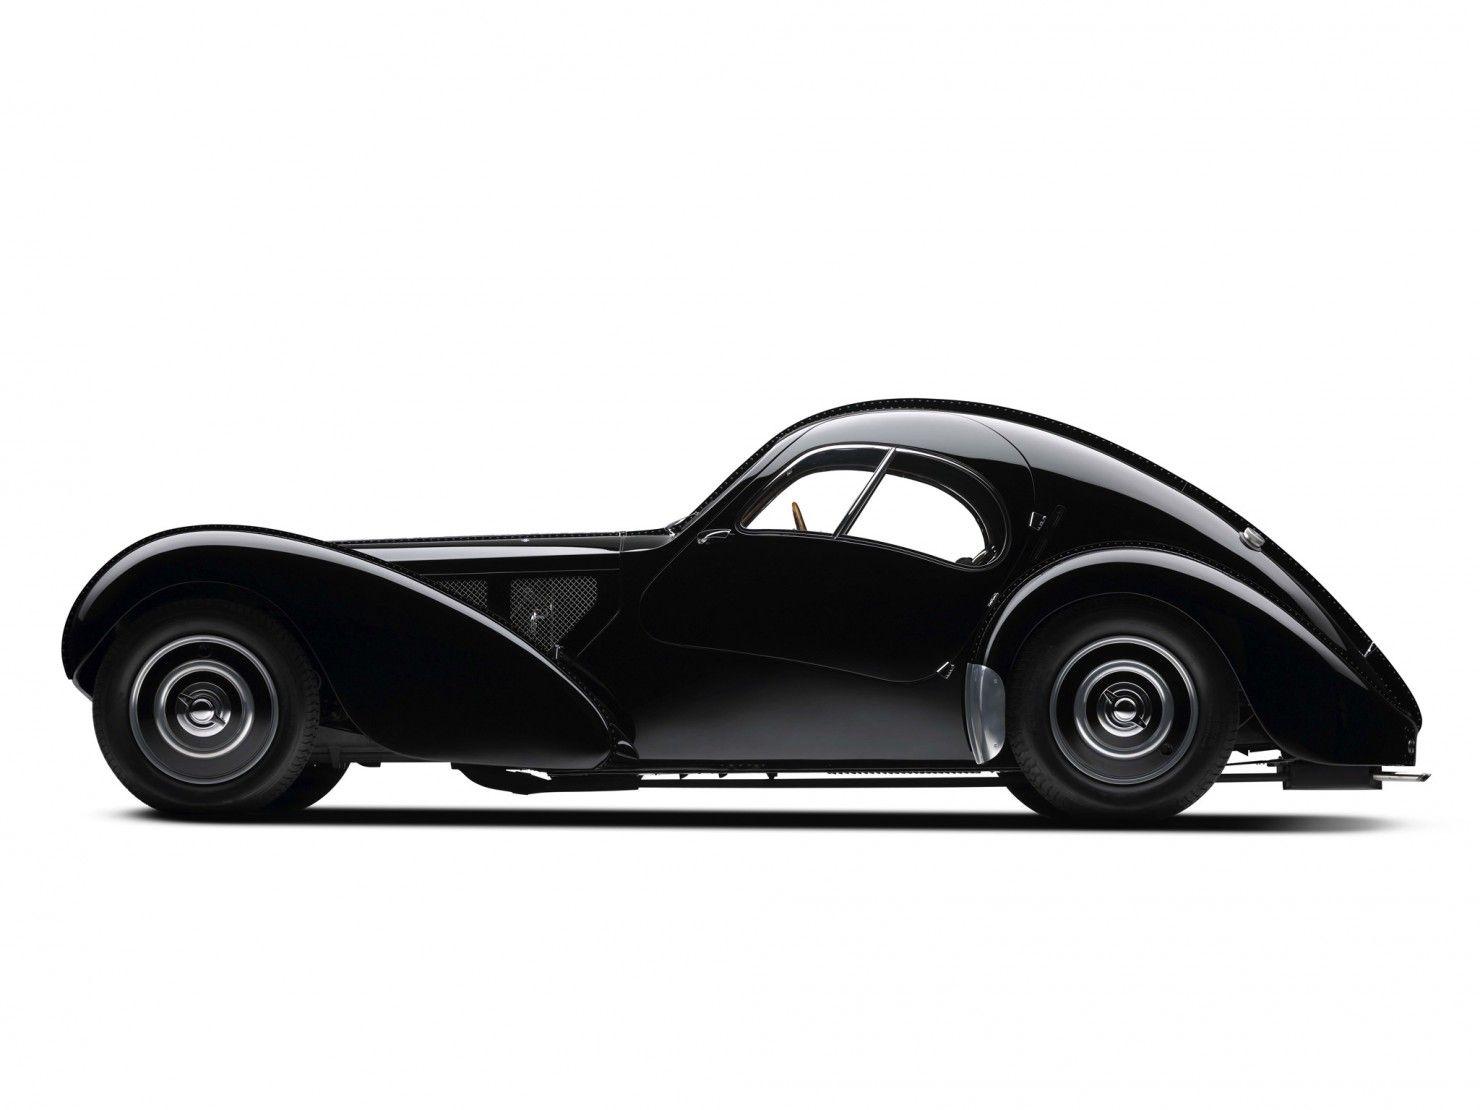 Bugatti Type 57sc Cutaway Wallpaper Bugatti Cars Bugatti Type 57 Bugatti